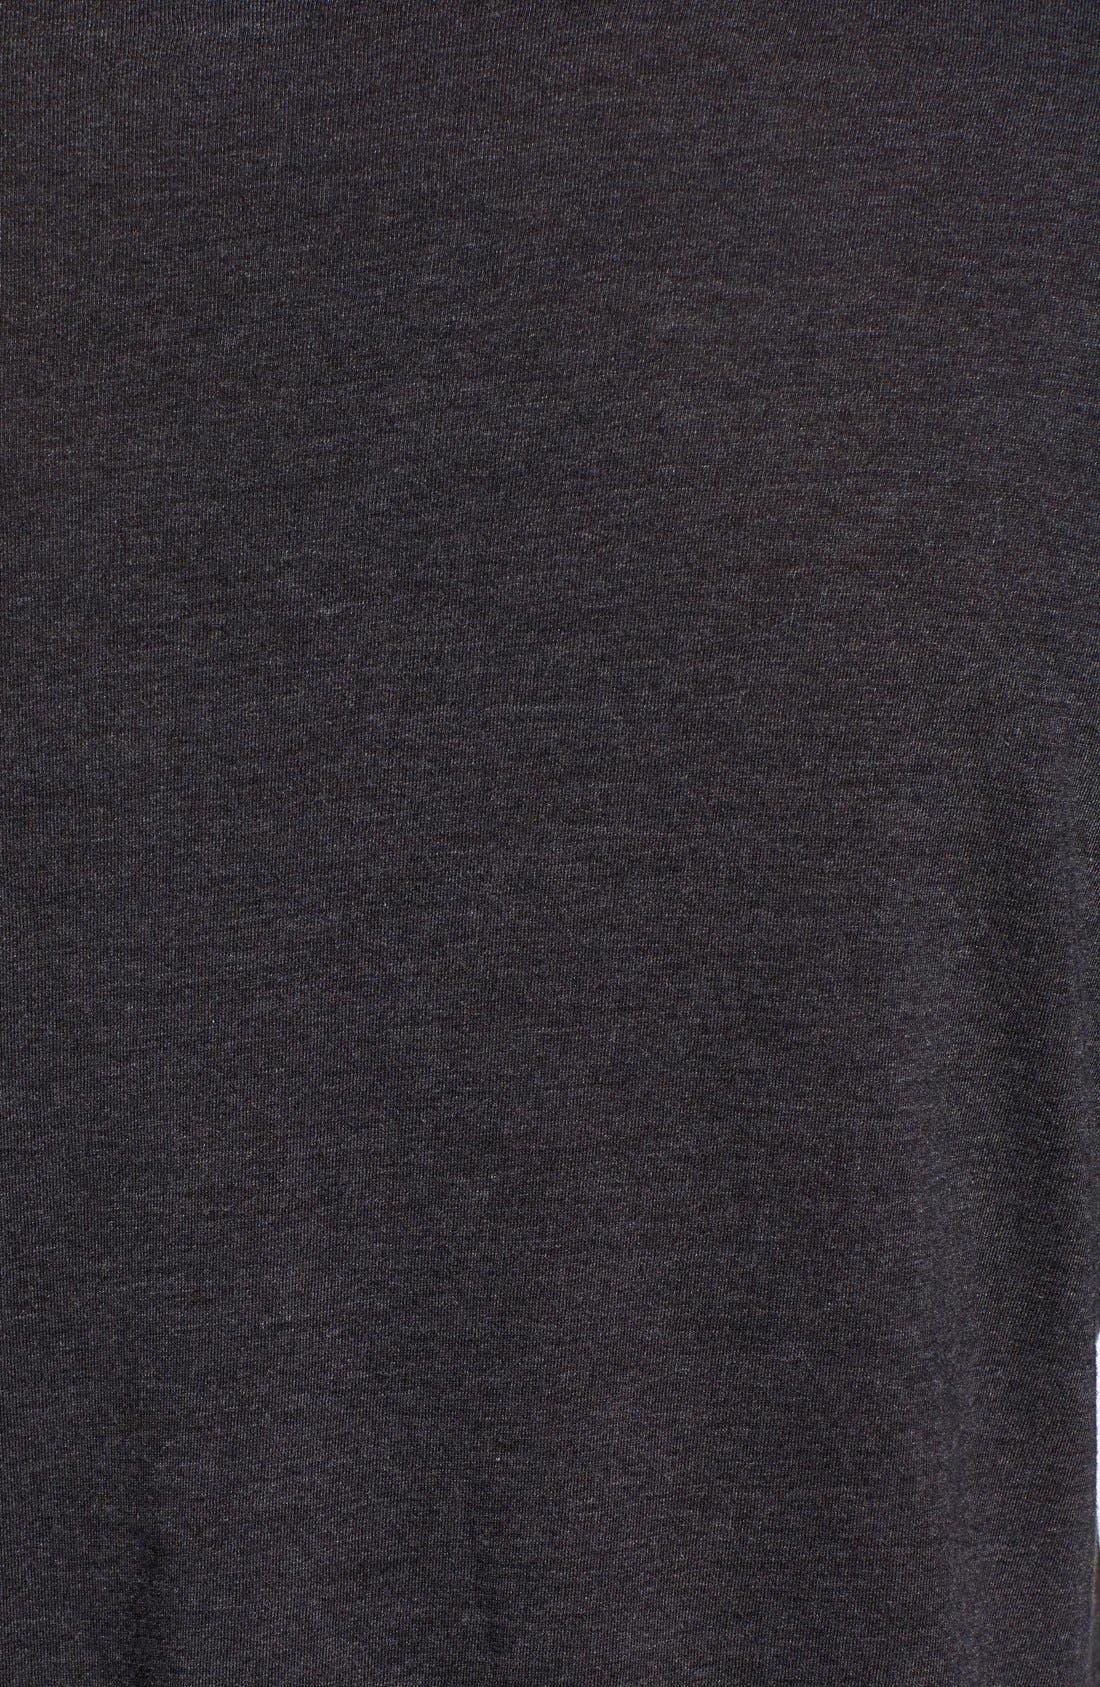 Knit Henley,                             Alternate thumbnail 7, color,